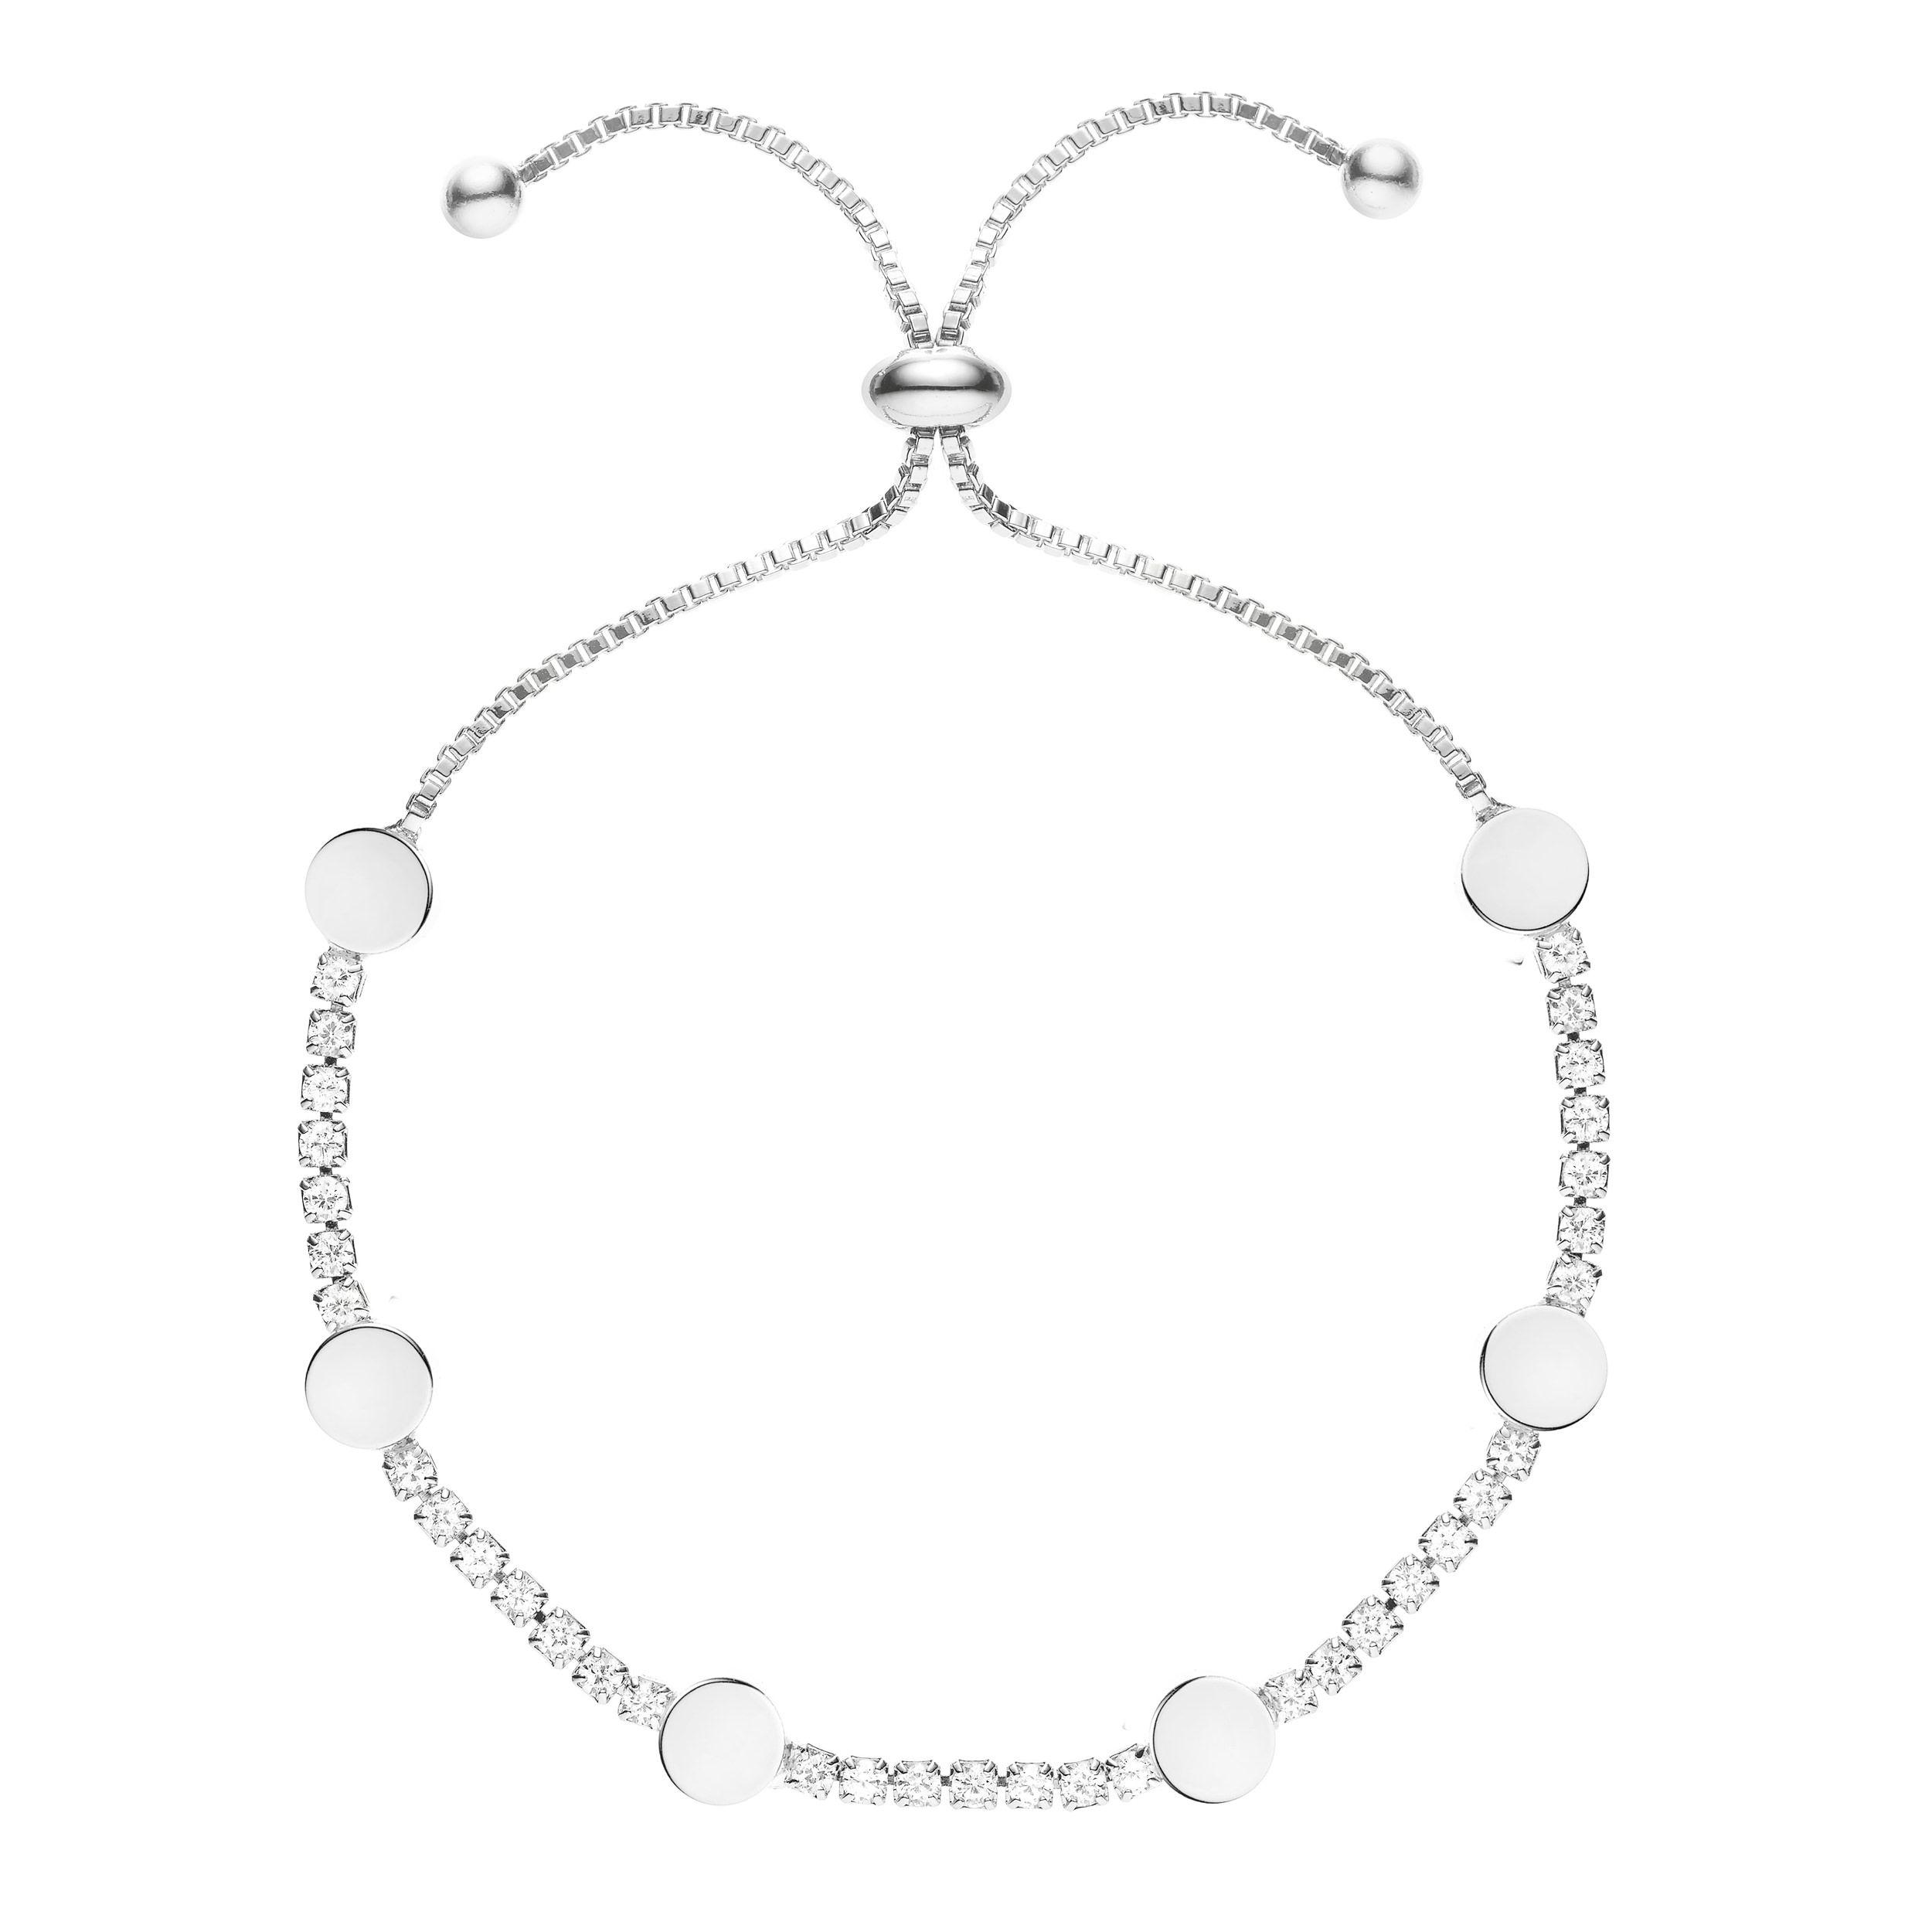 Buckley London Hugs & Kisses 'O' Bracelet - Silver